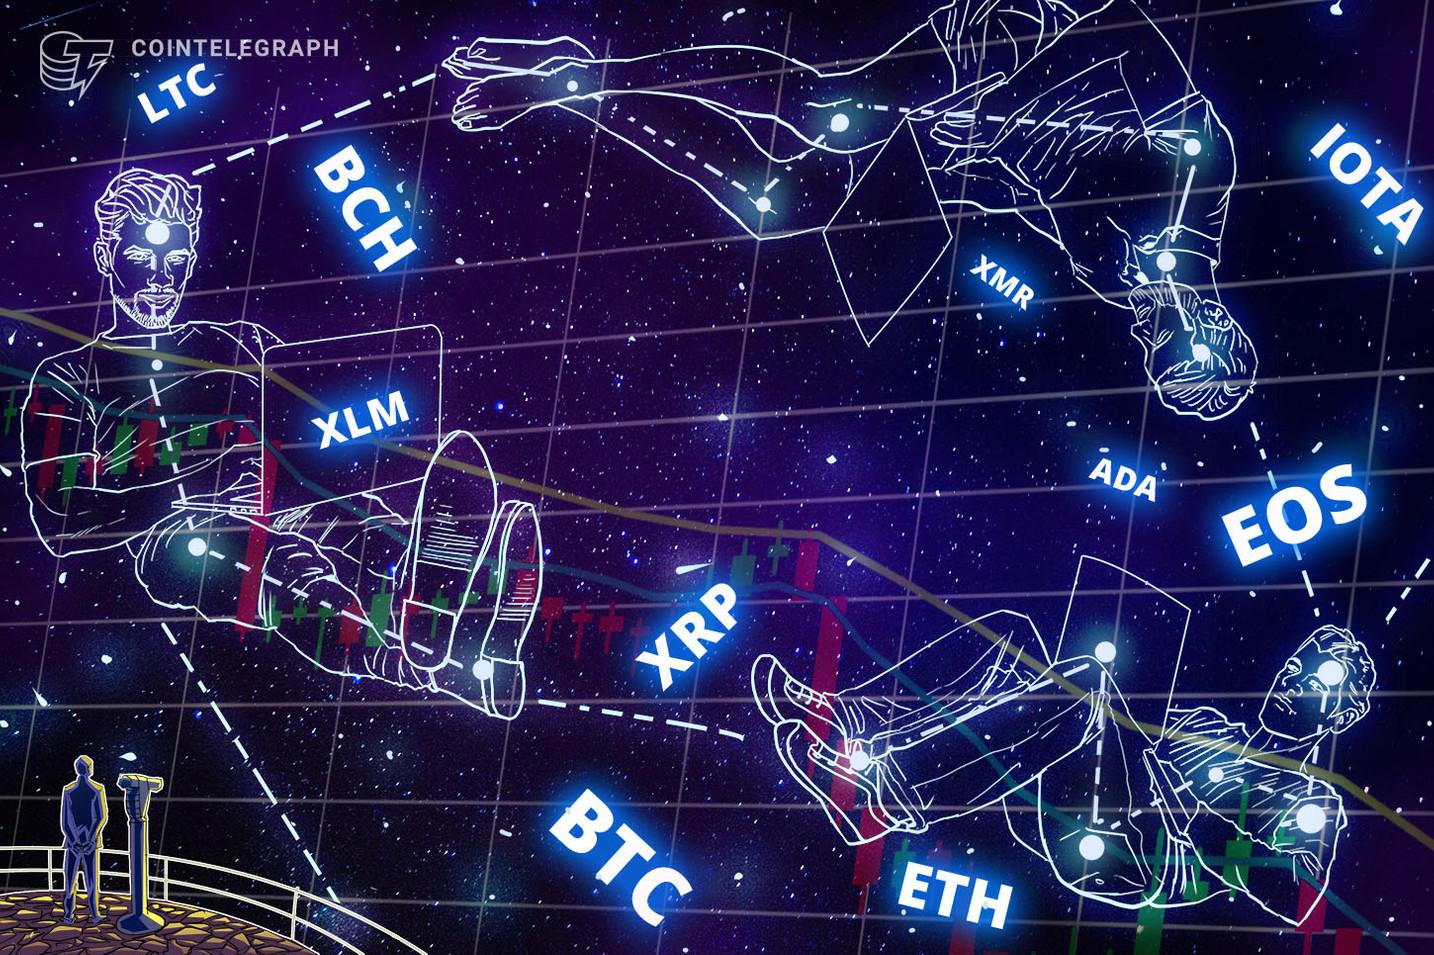 Kursanalyse, 10. Oktober: Bitcoin, Ethereum, Ripple, Bitcoin Cash, EOS, Stellar, Litecoin, Cardano, Monero, TRON